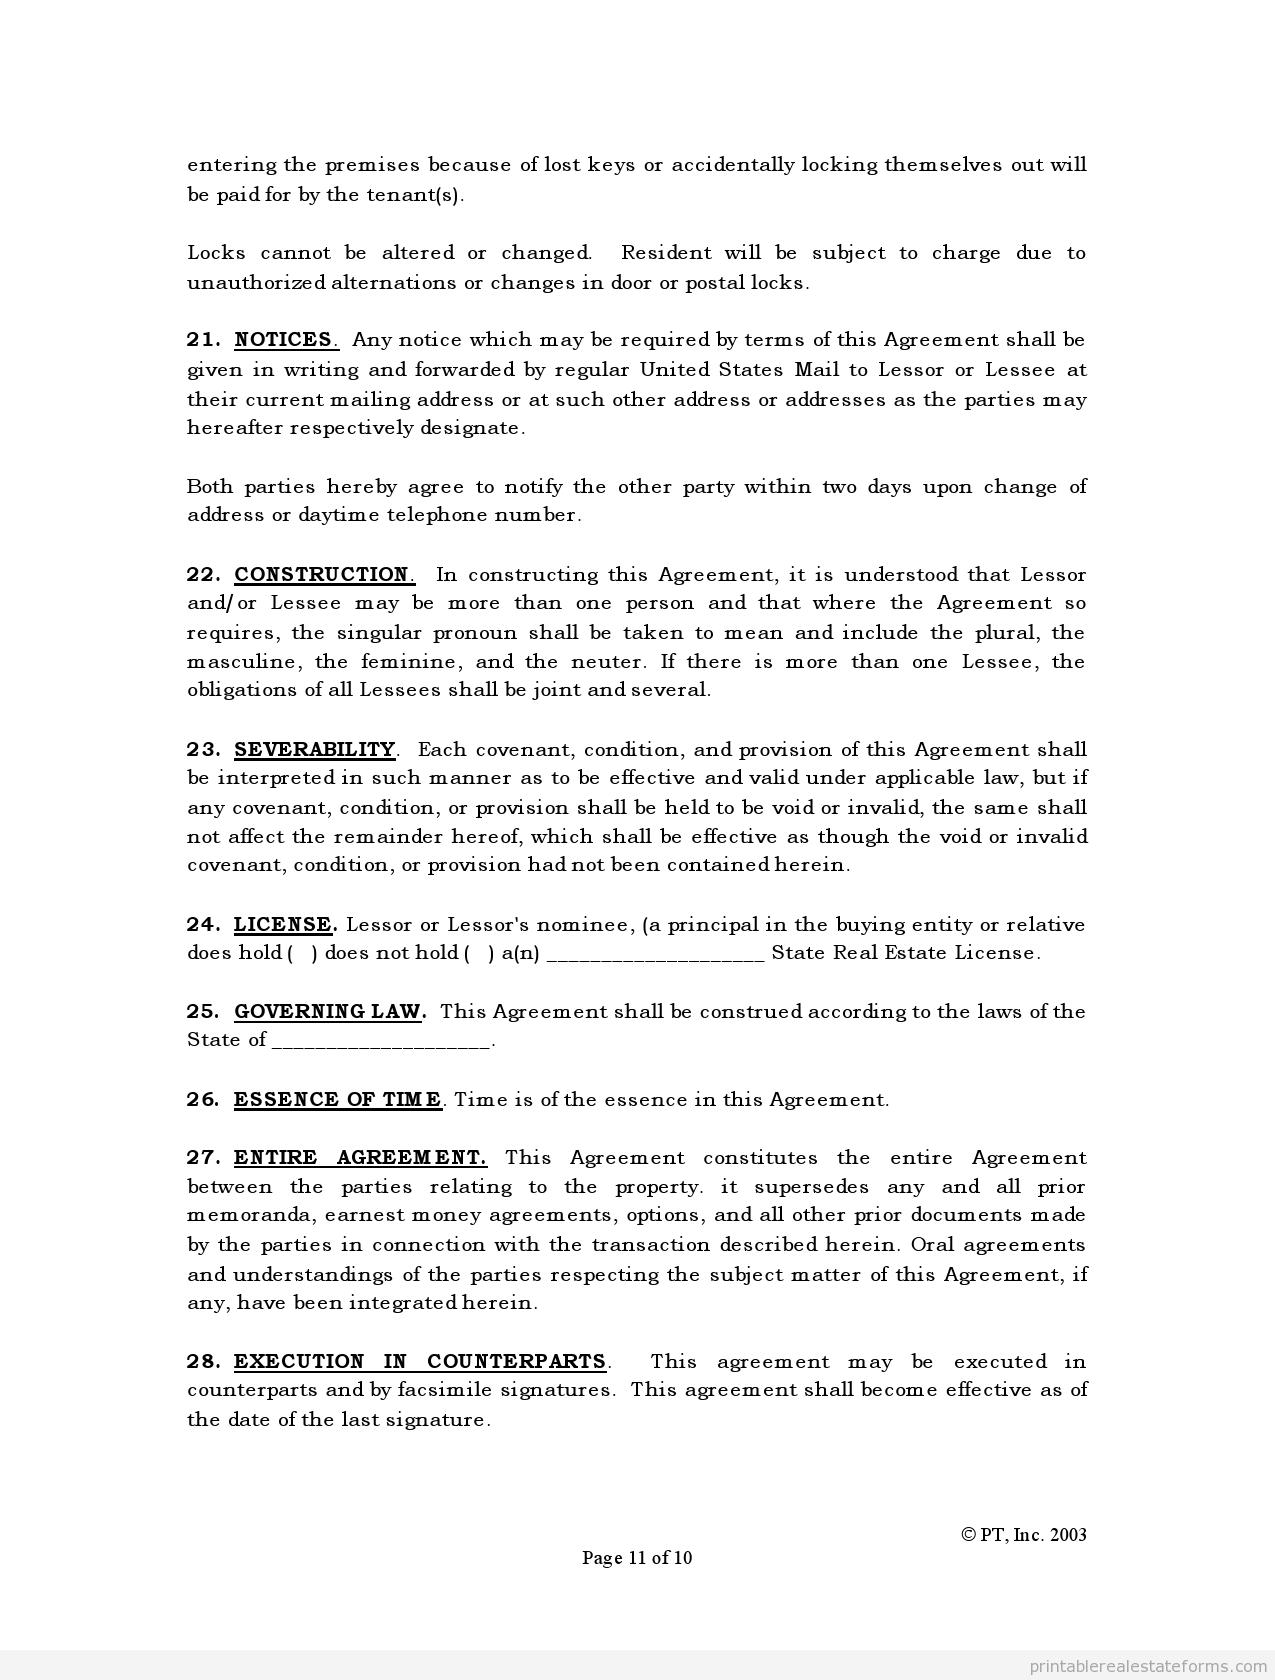 agreement editable word document